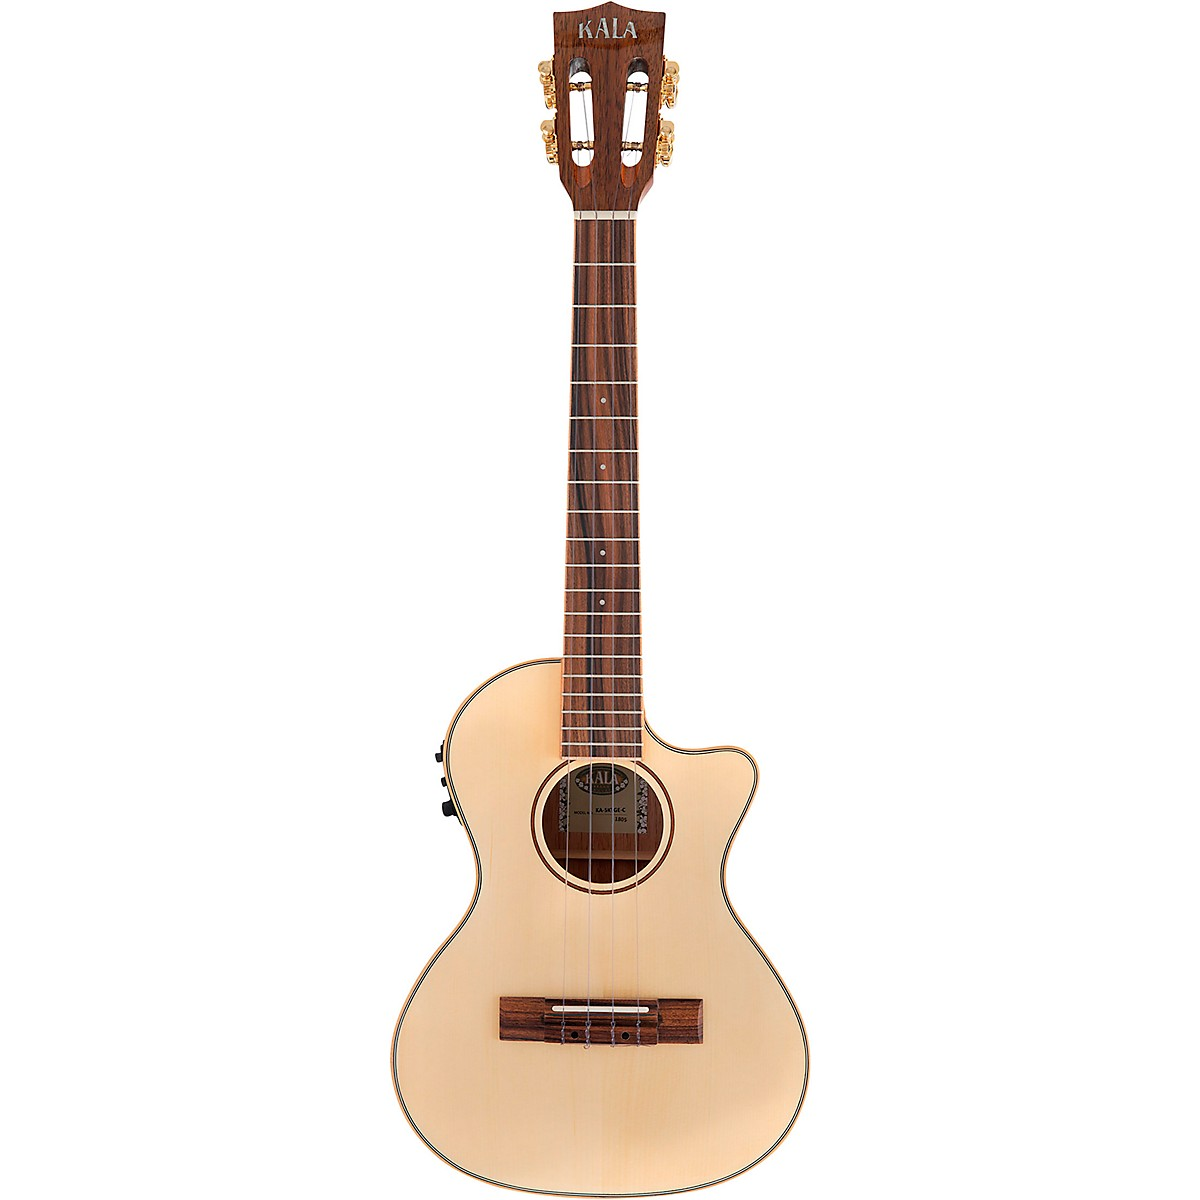 Kala Solid Spruce Top Koa Gloss Cutaway Acoustic-Electric Tenor Ukulele